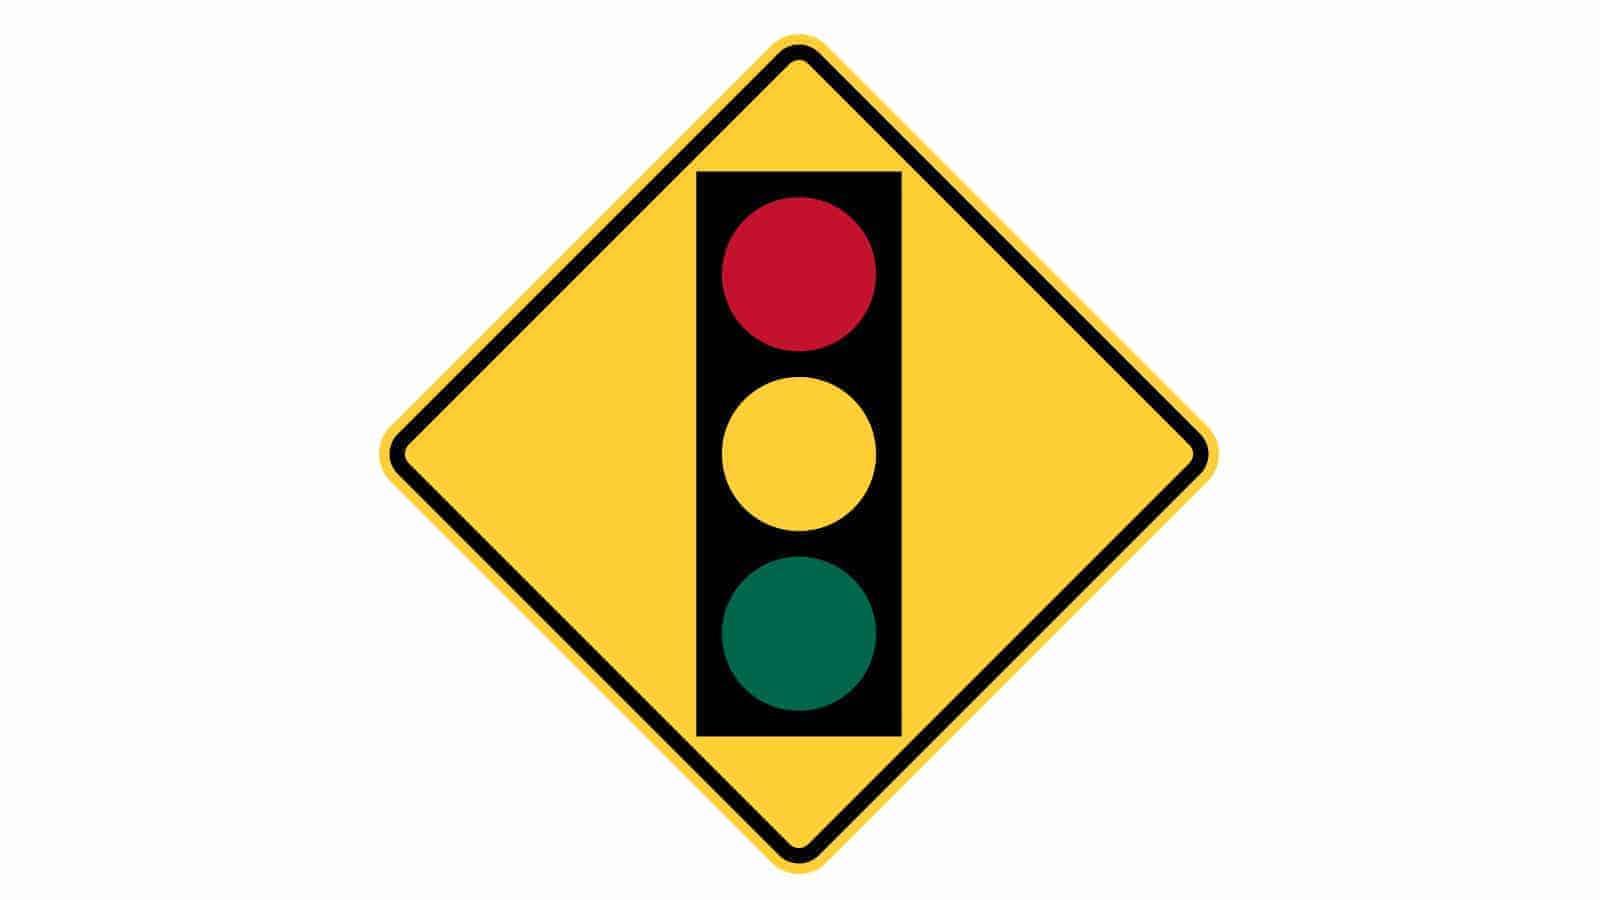 Warning sign traffic lights ahead